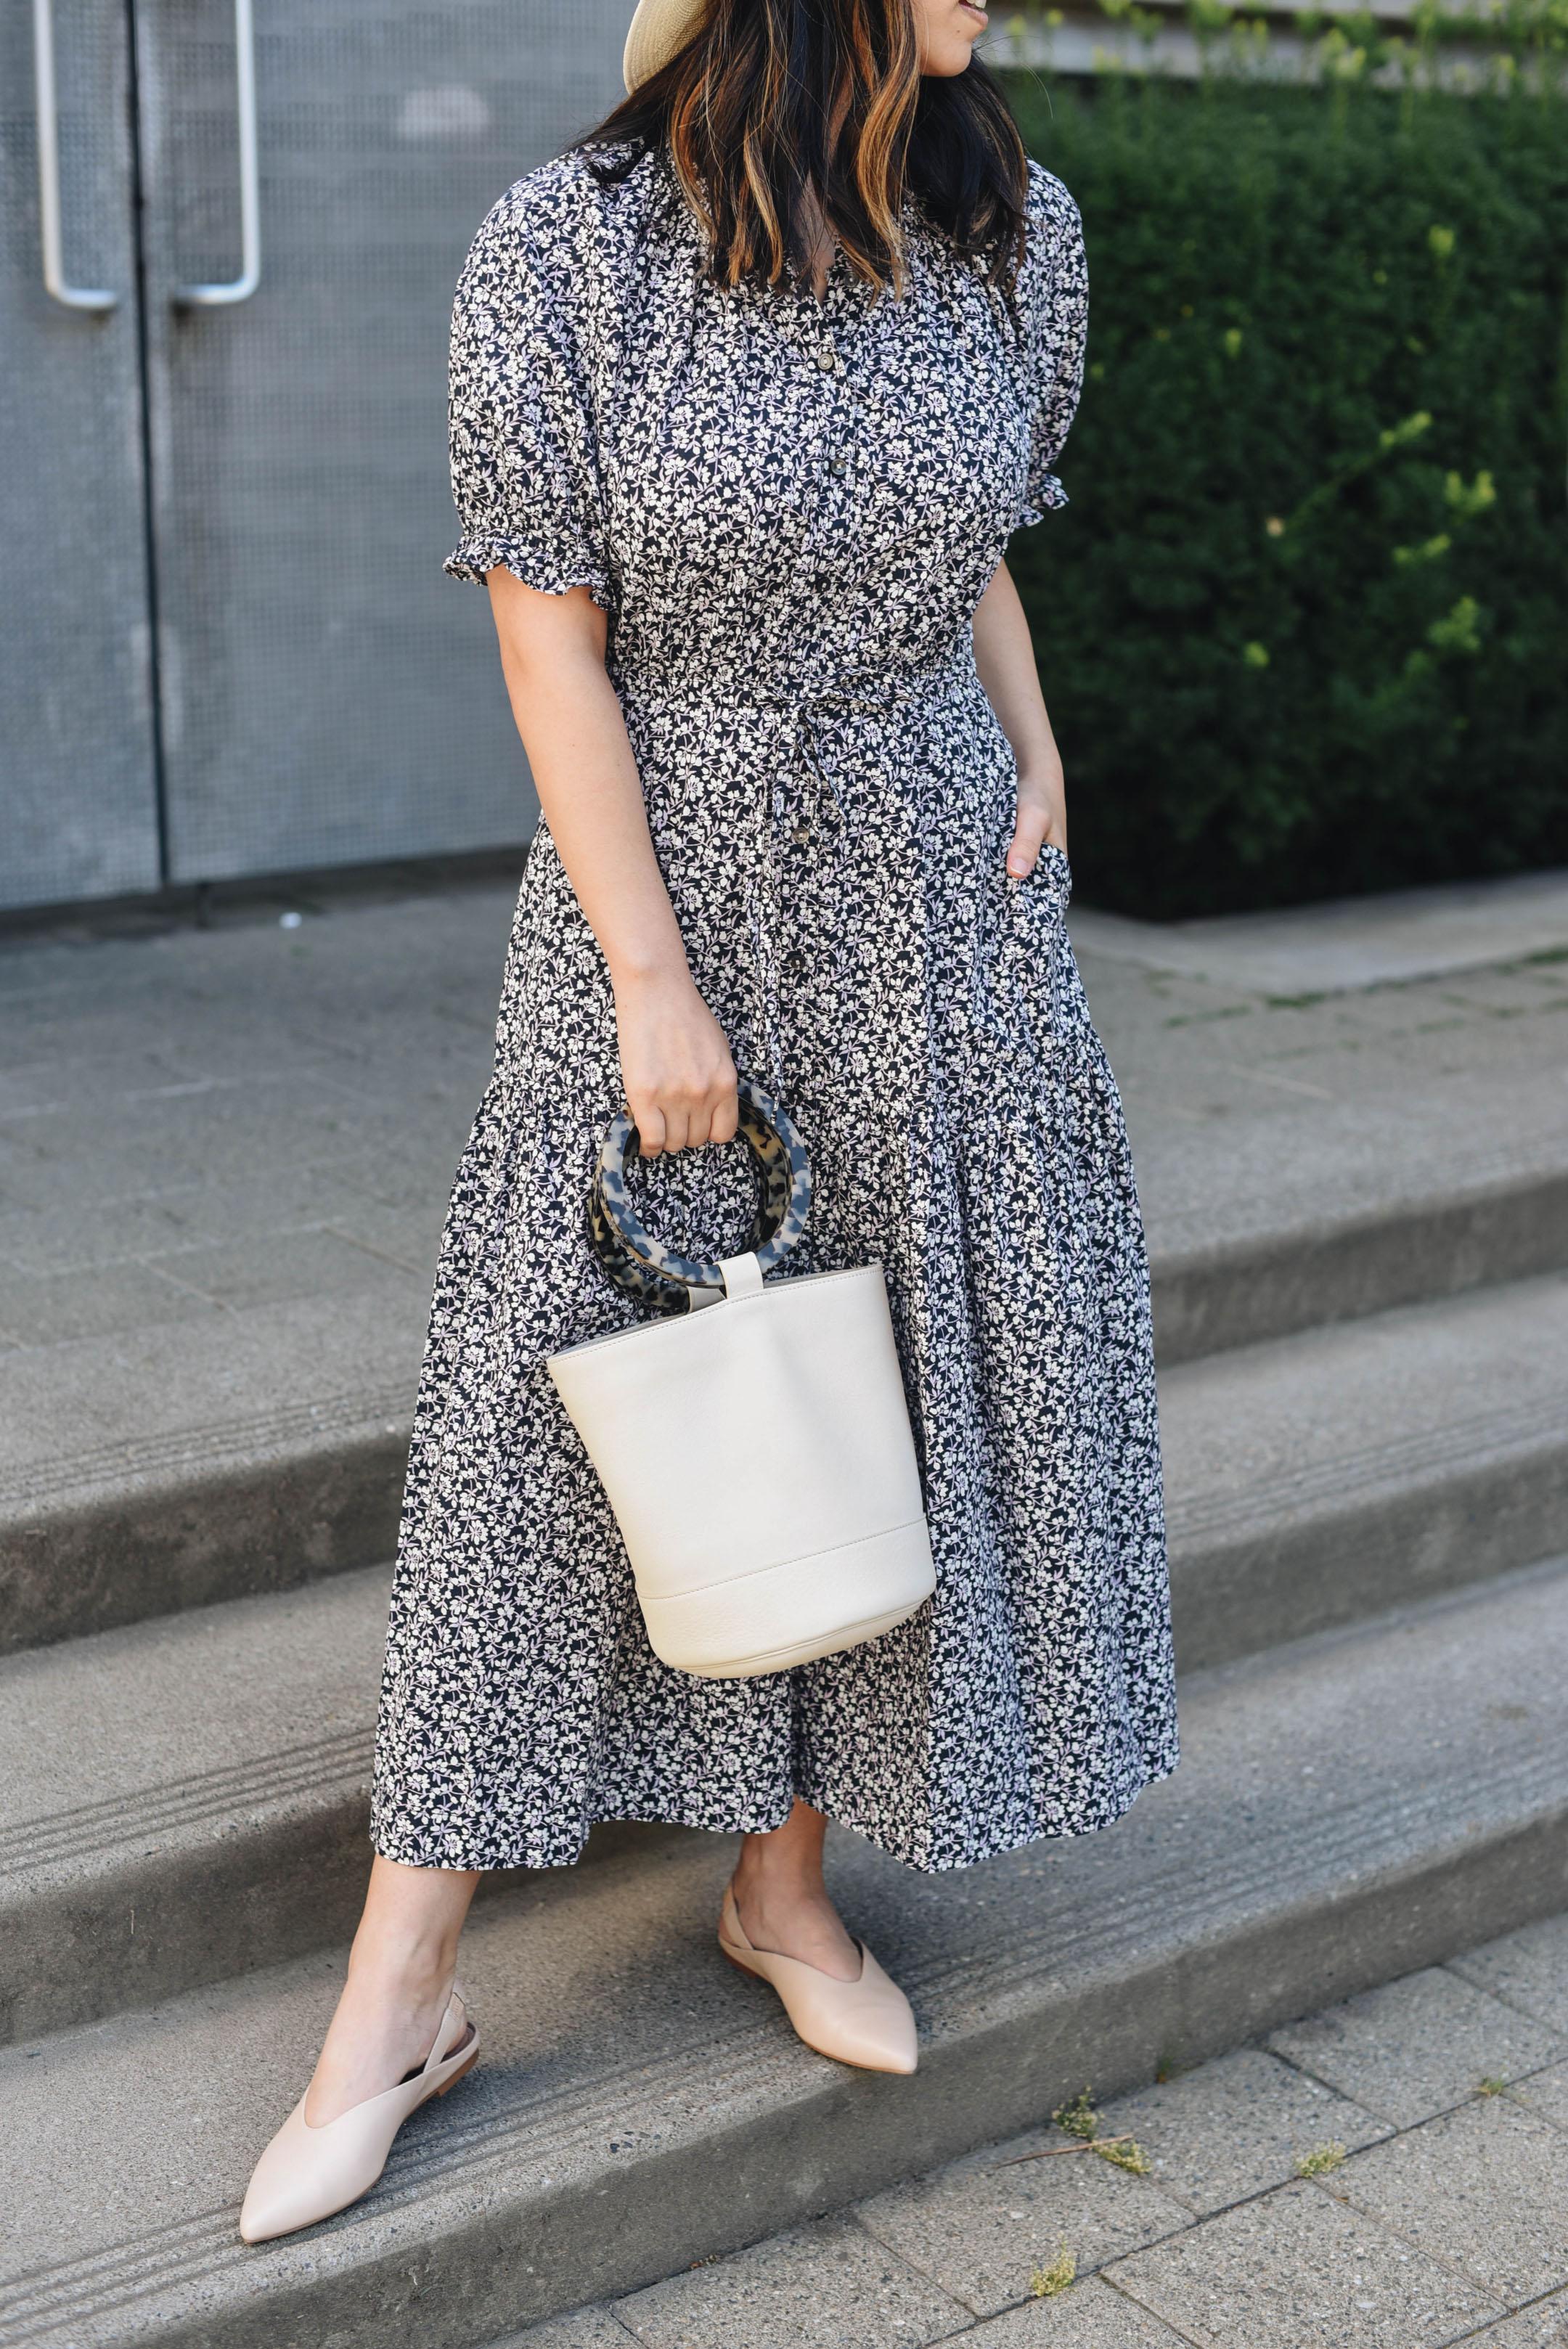 La Vie Rebecca Taylor dress 4